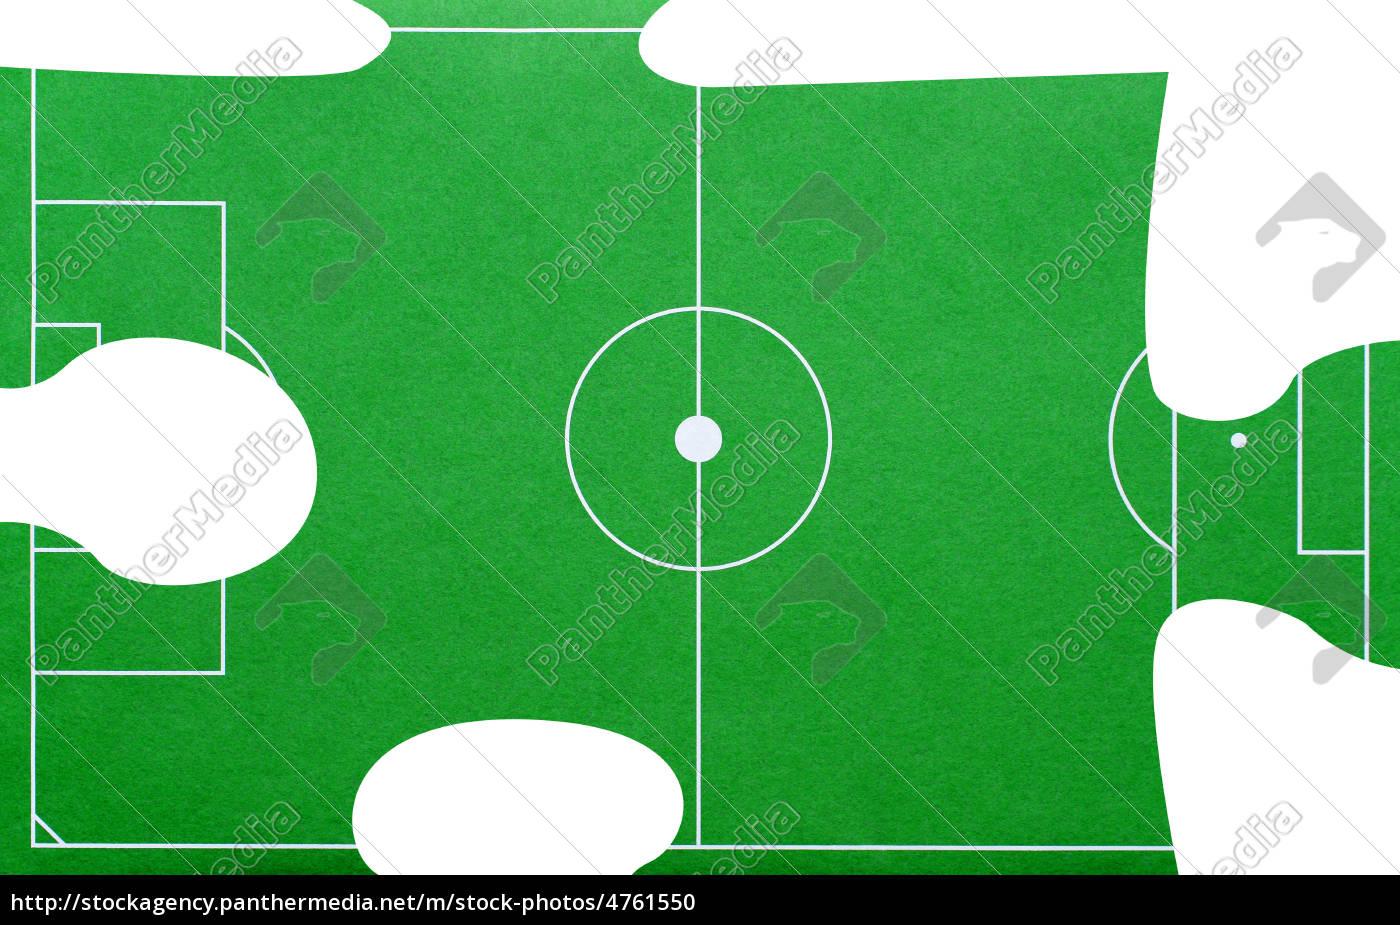 Stock Bild 4761550 Football Soccer Fussball Puzzle